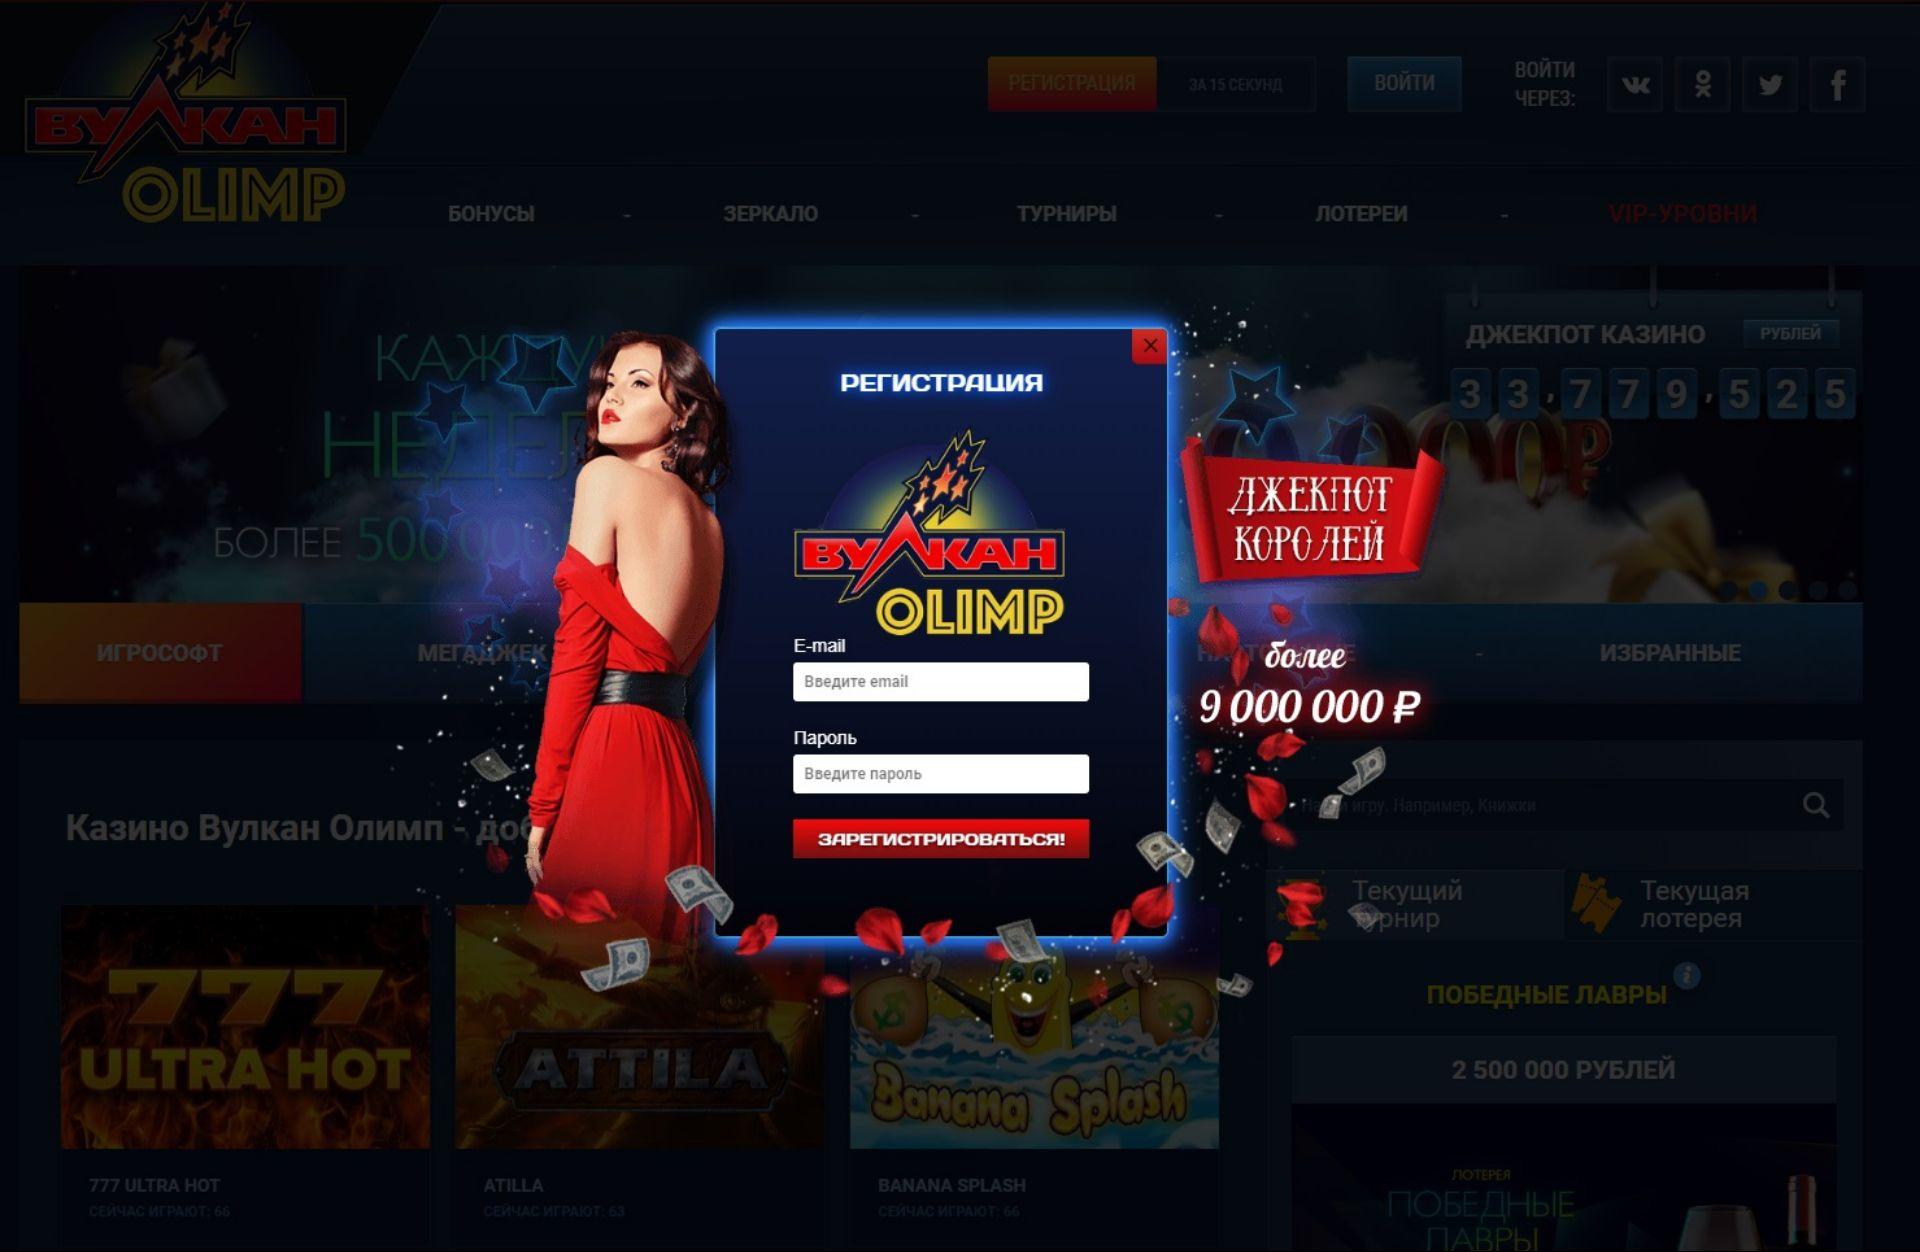 онлайн казино вулкан олимп новый сайт зеркало